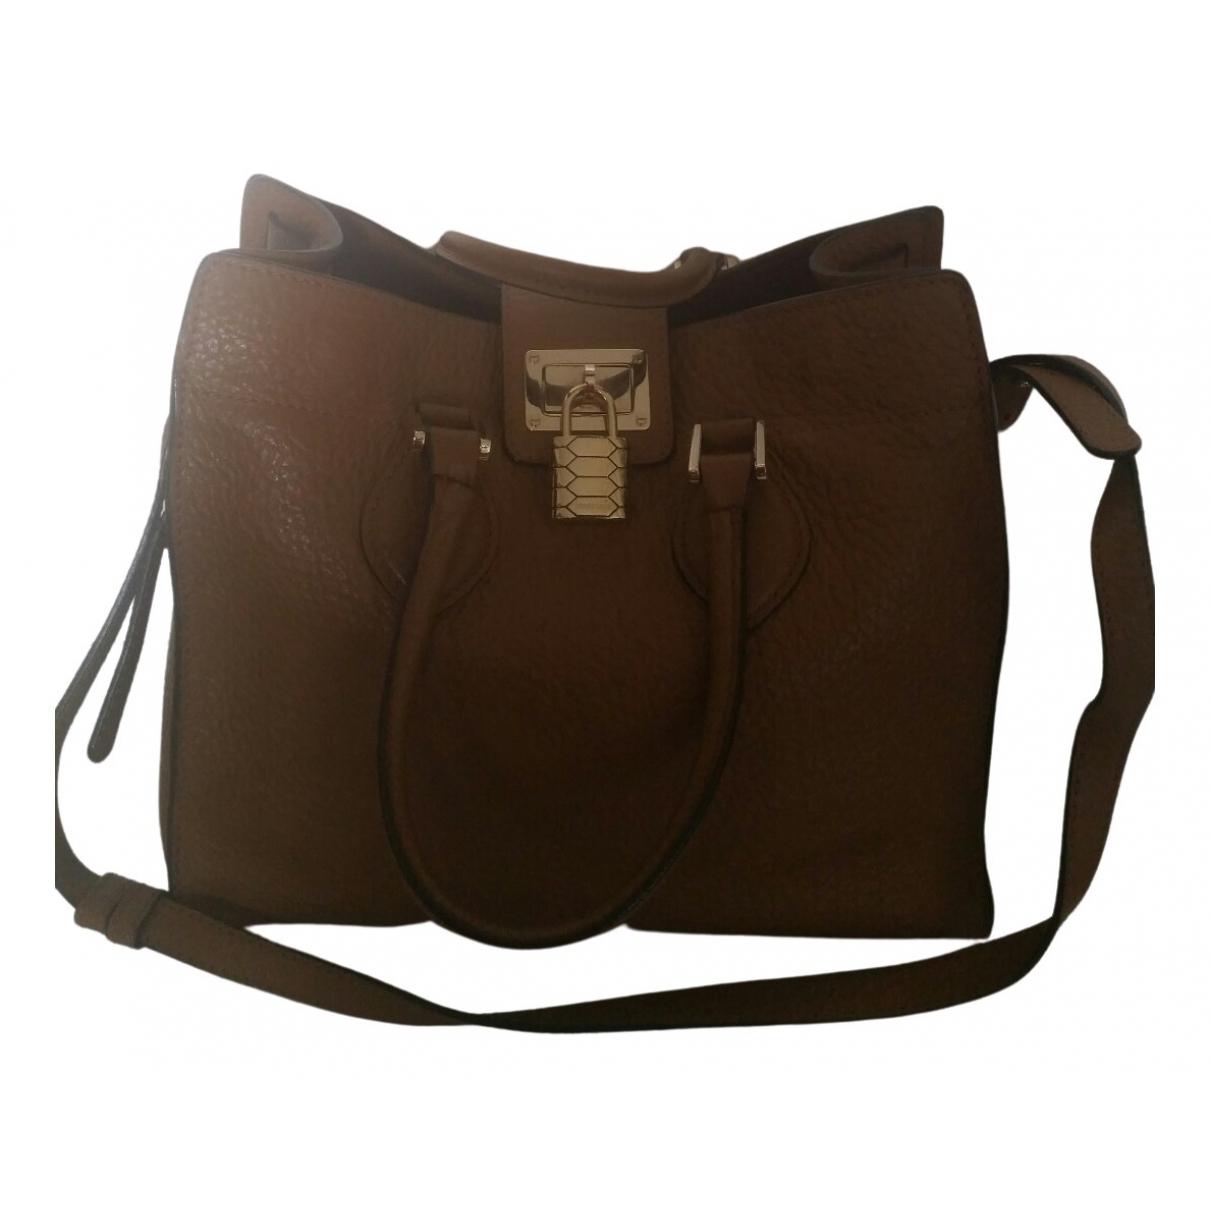 Roberto Cavalli \N Brown Leather handbag for Women \N